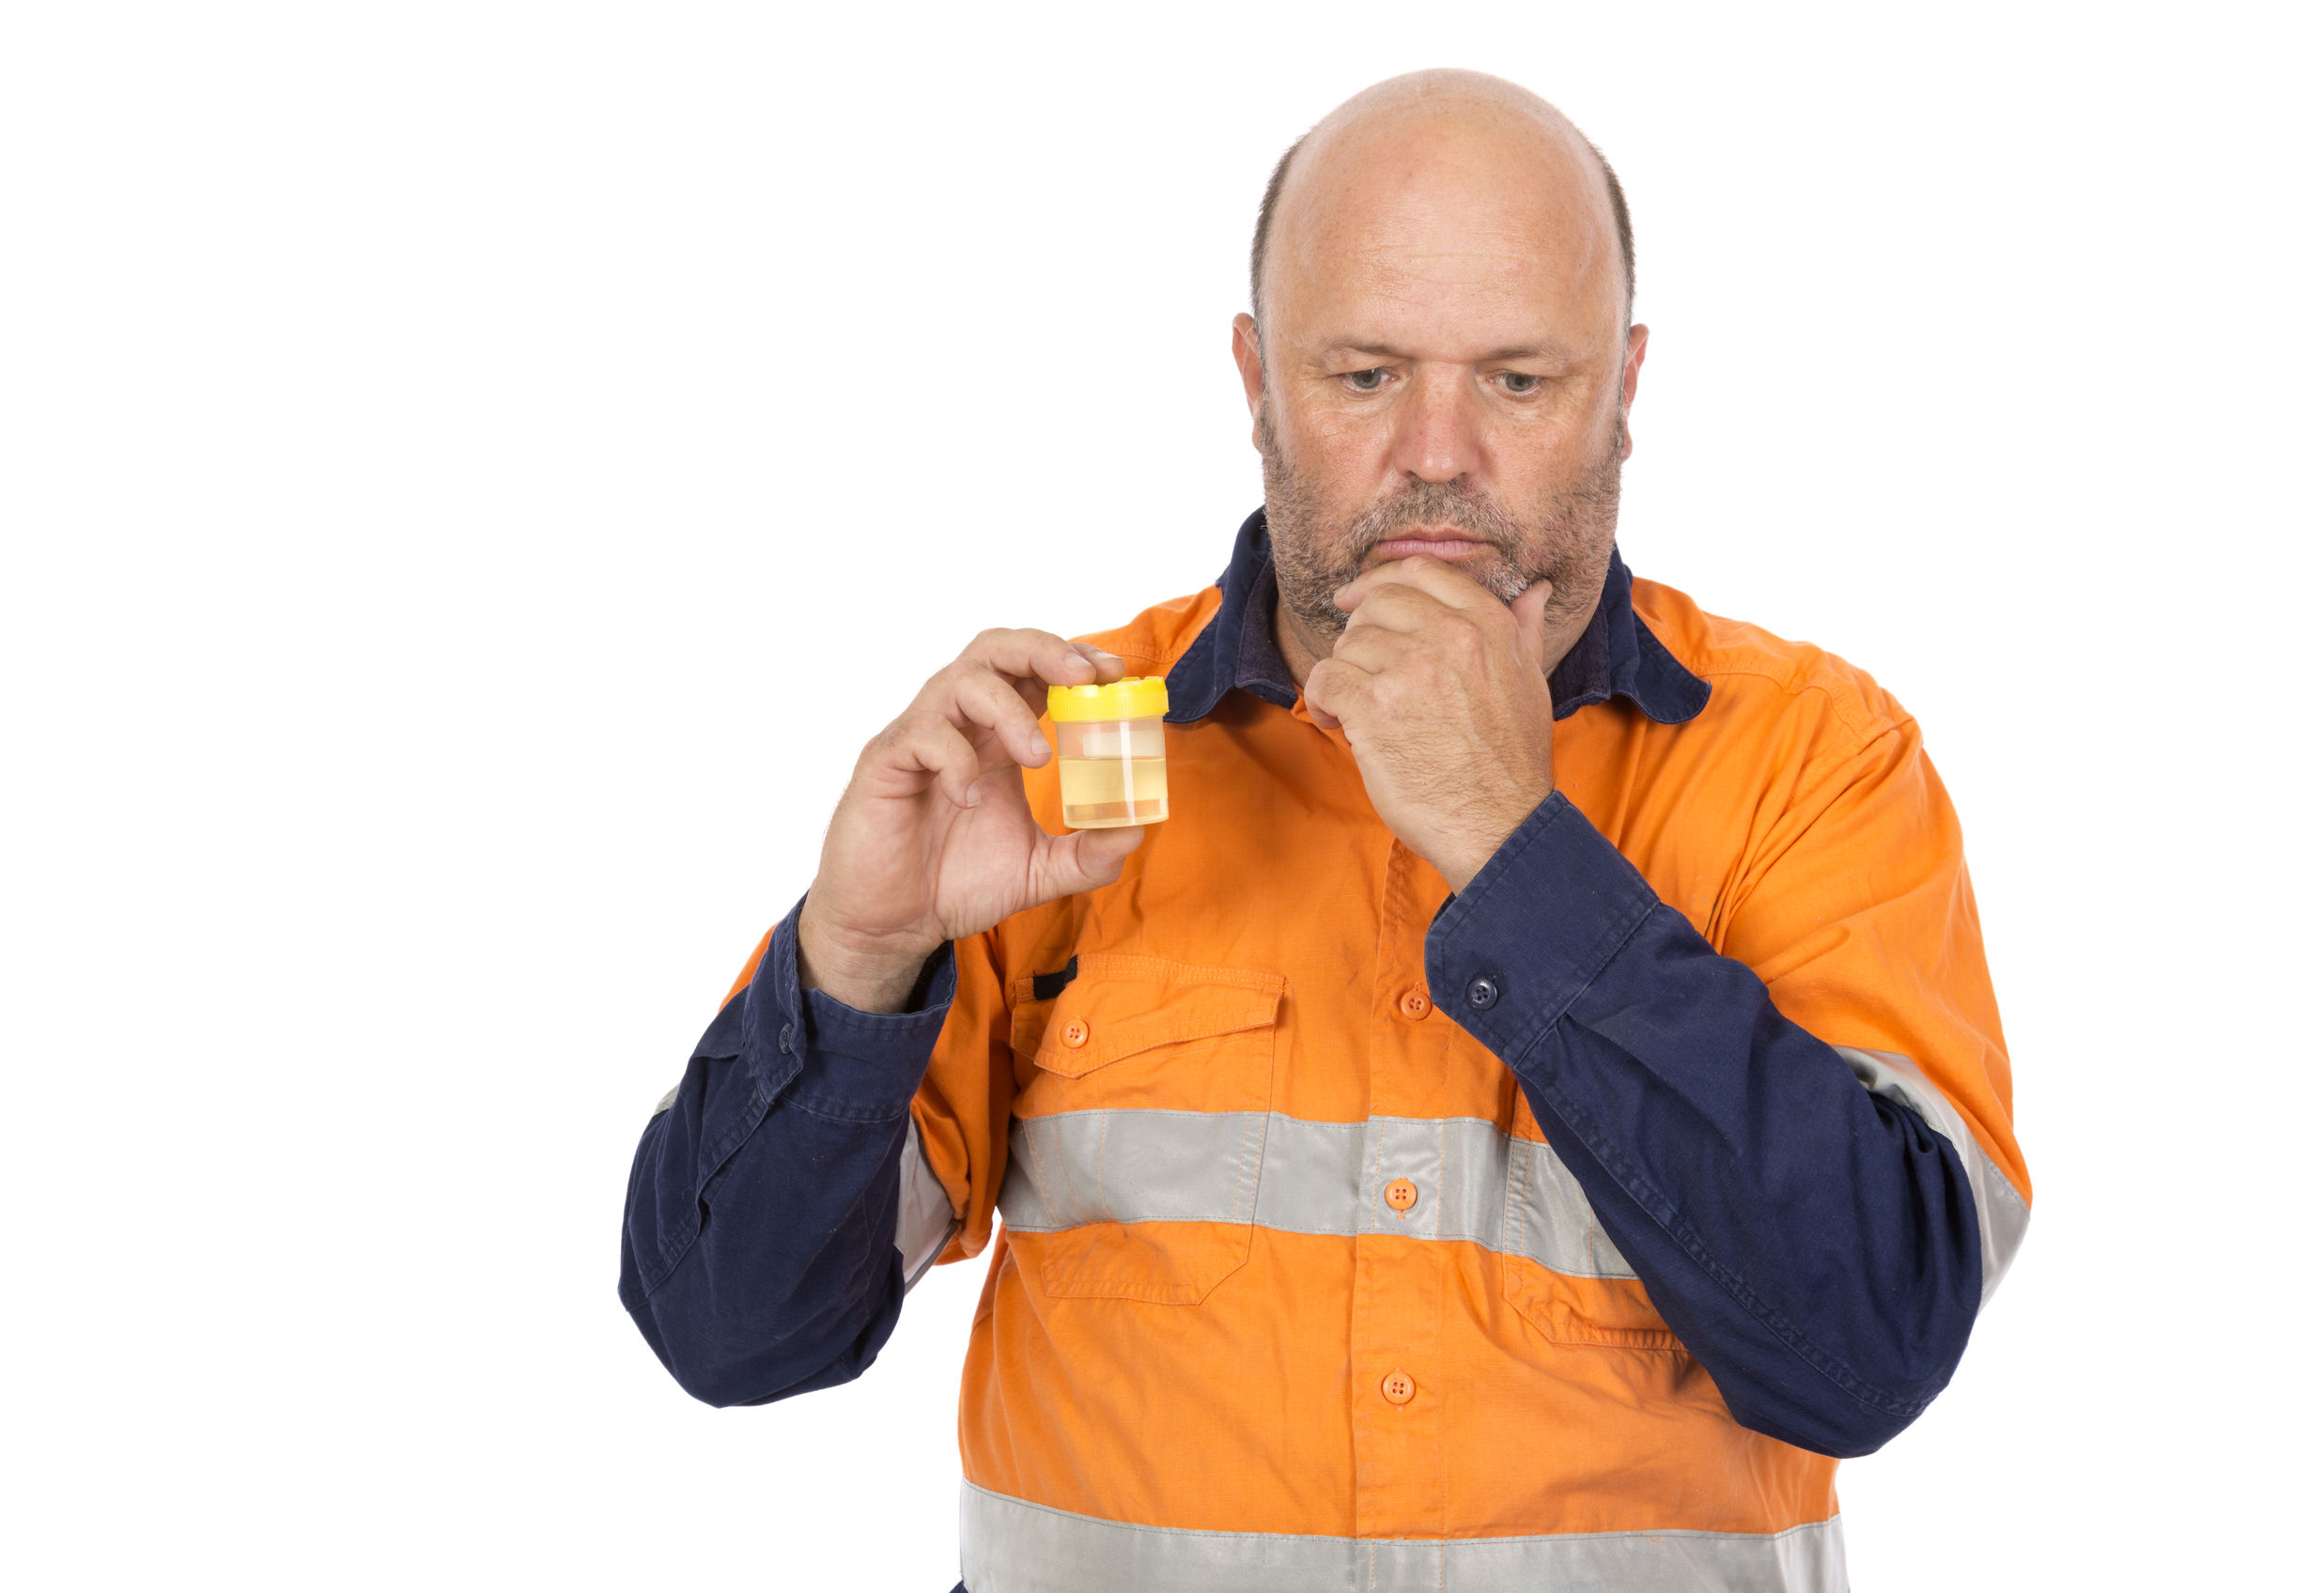 The Top Ten Benefits of Random Drug Testing at Work